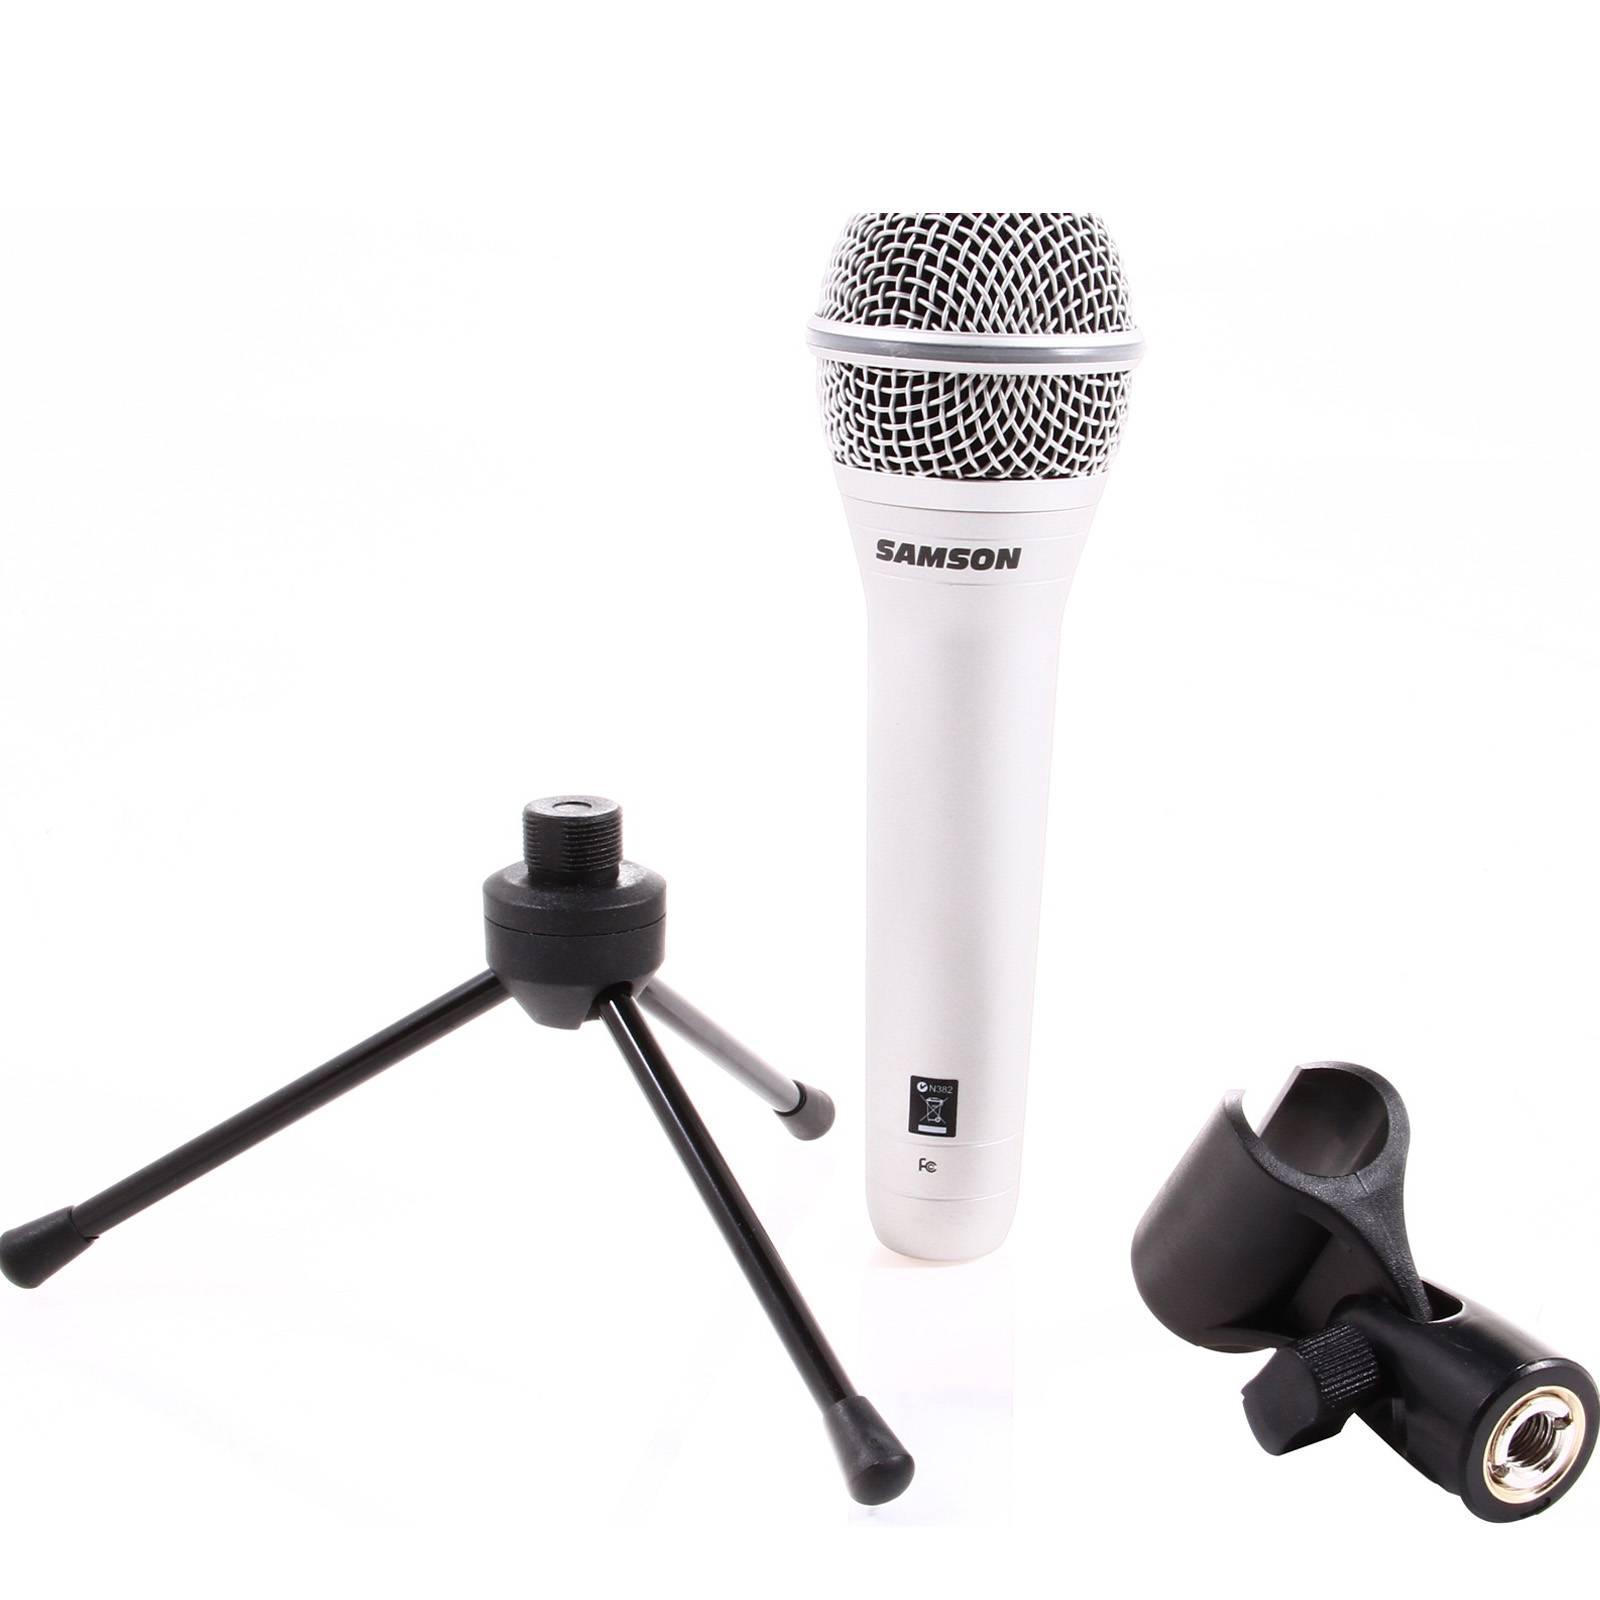 samson q1u dynamic usb microphone for vocal recording includes stand software microphones. Black Bedroom Furniture Sets. Home Design Ideas